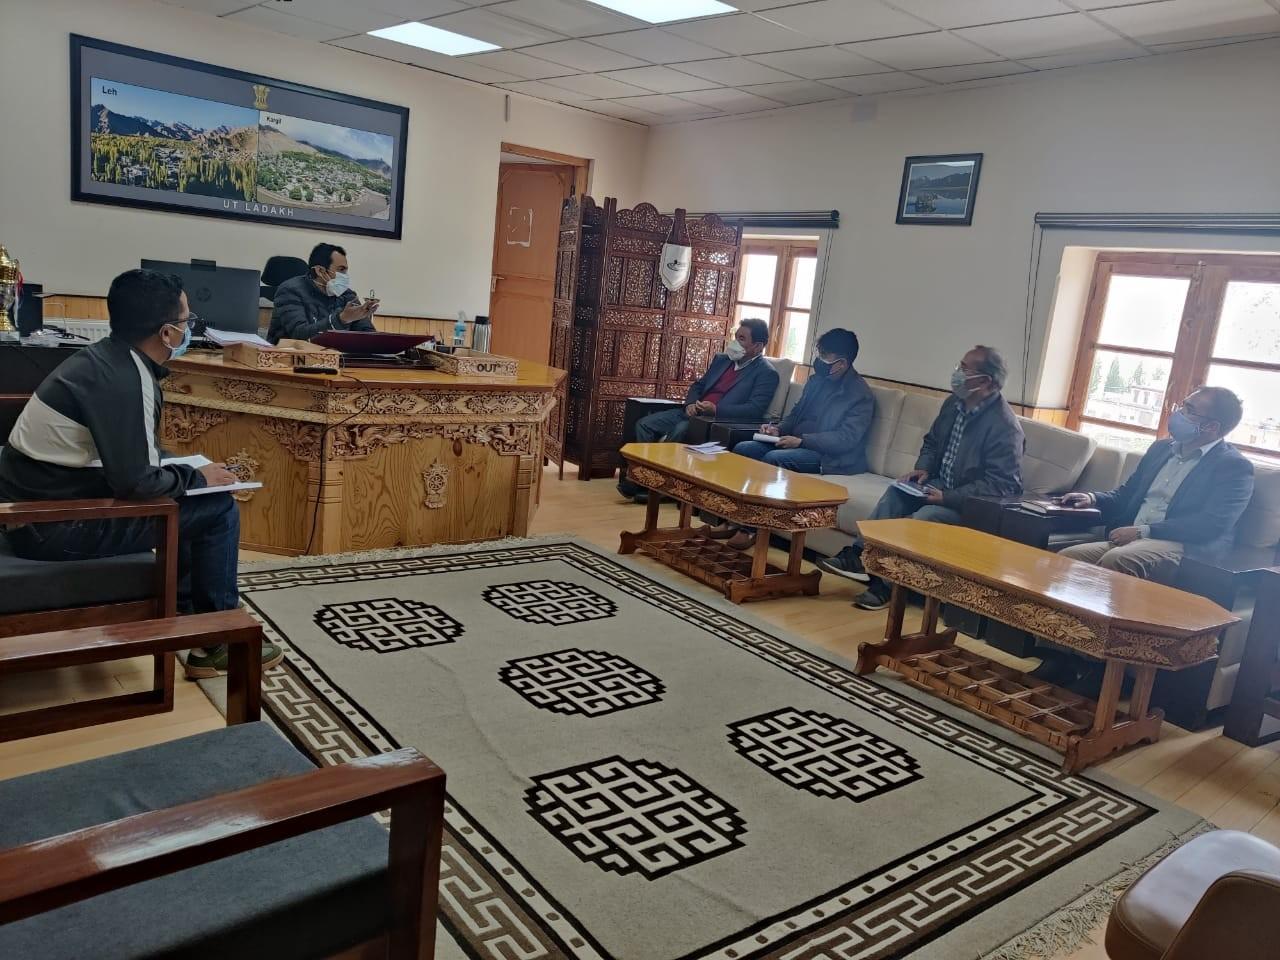 Ravinder Kumar convenes a meeting on honey production in Ladakh